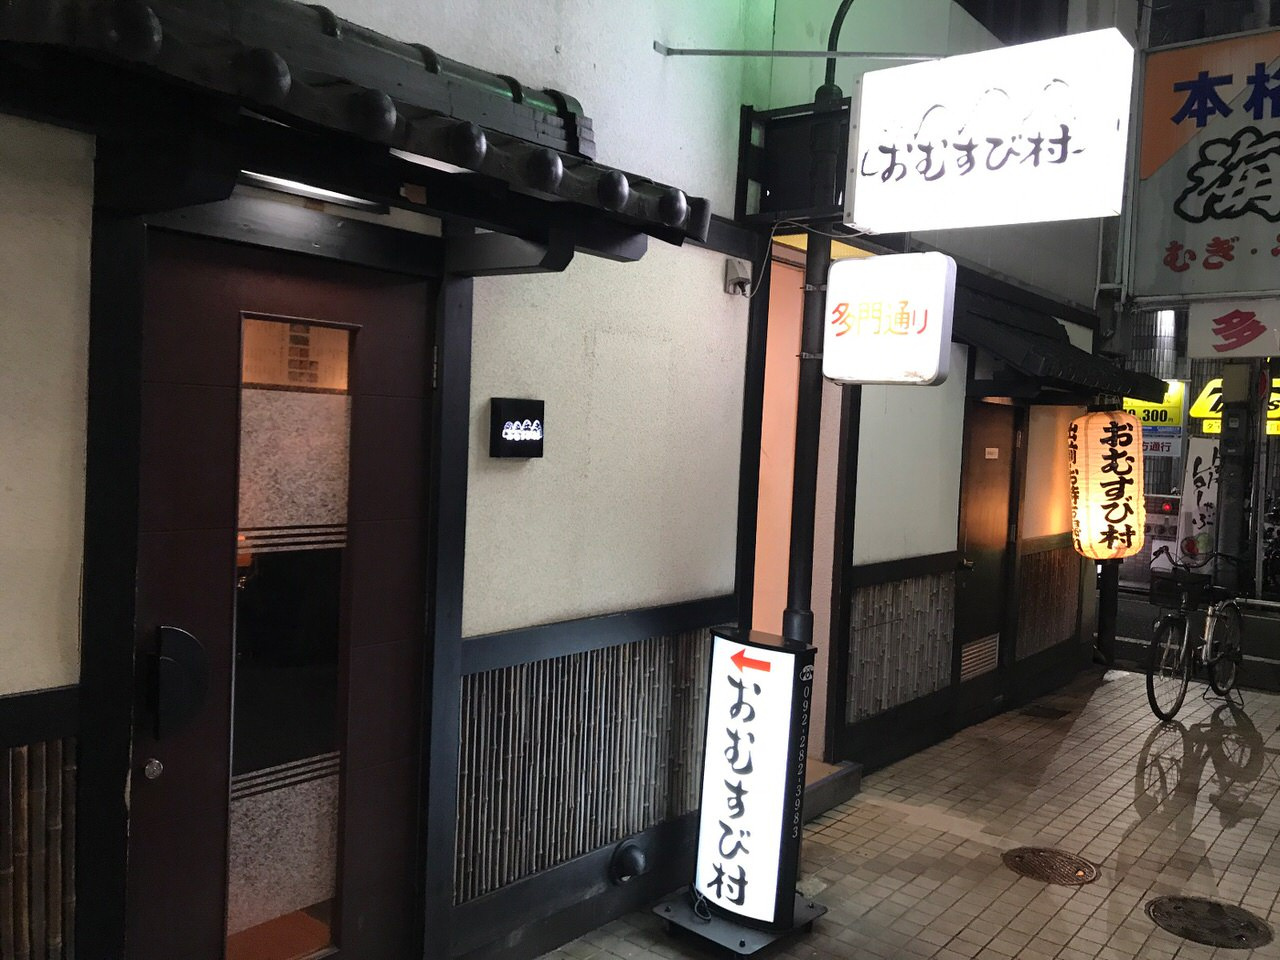 Omusubimura 9706